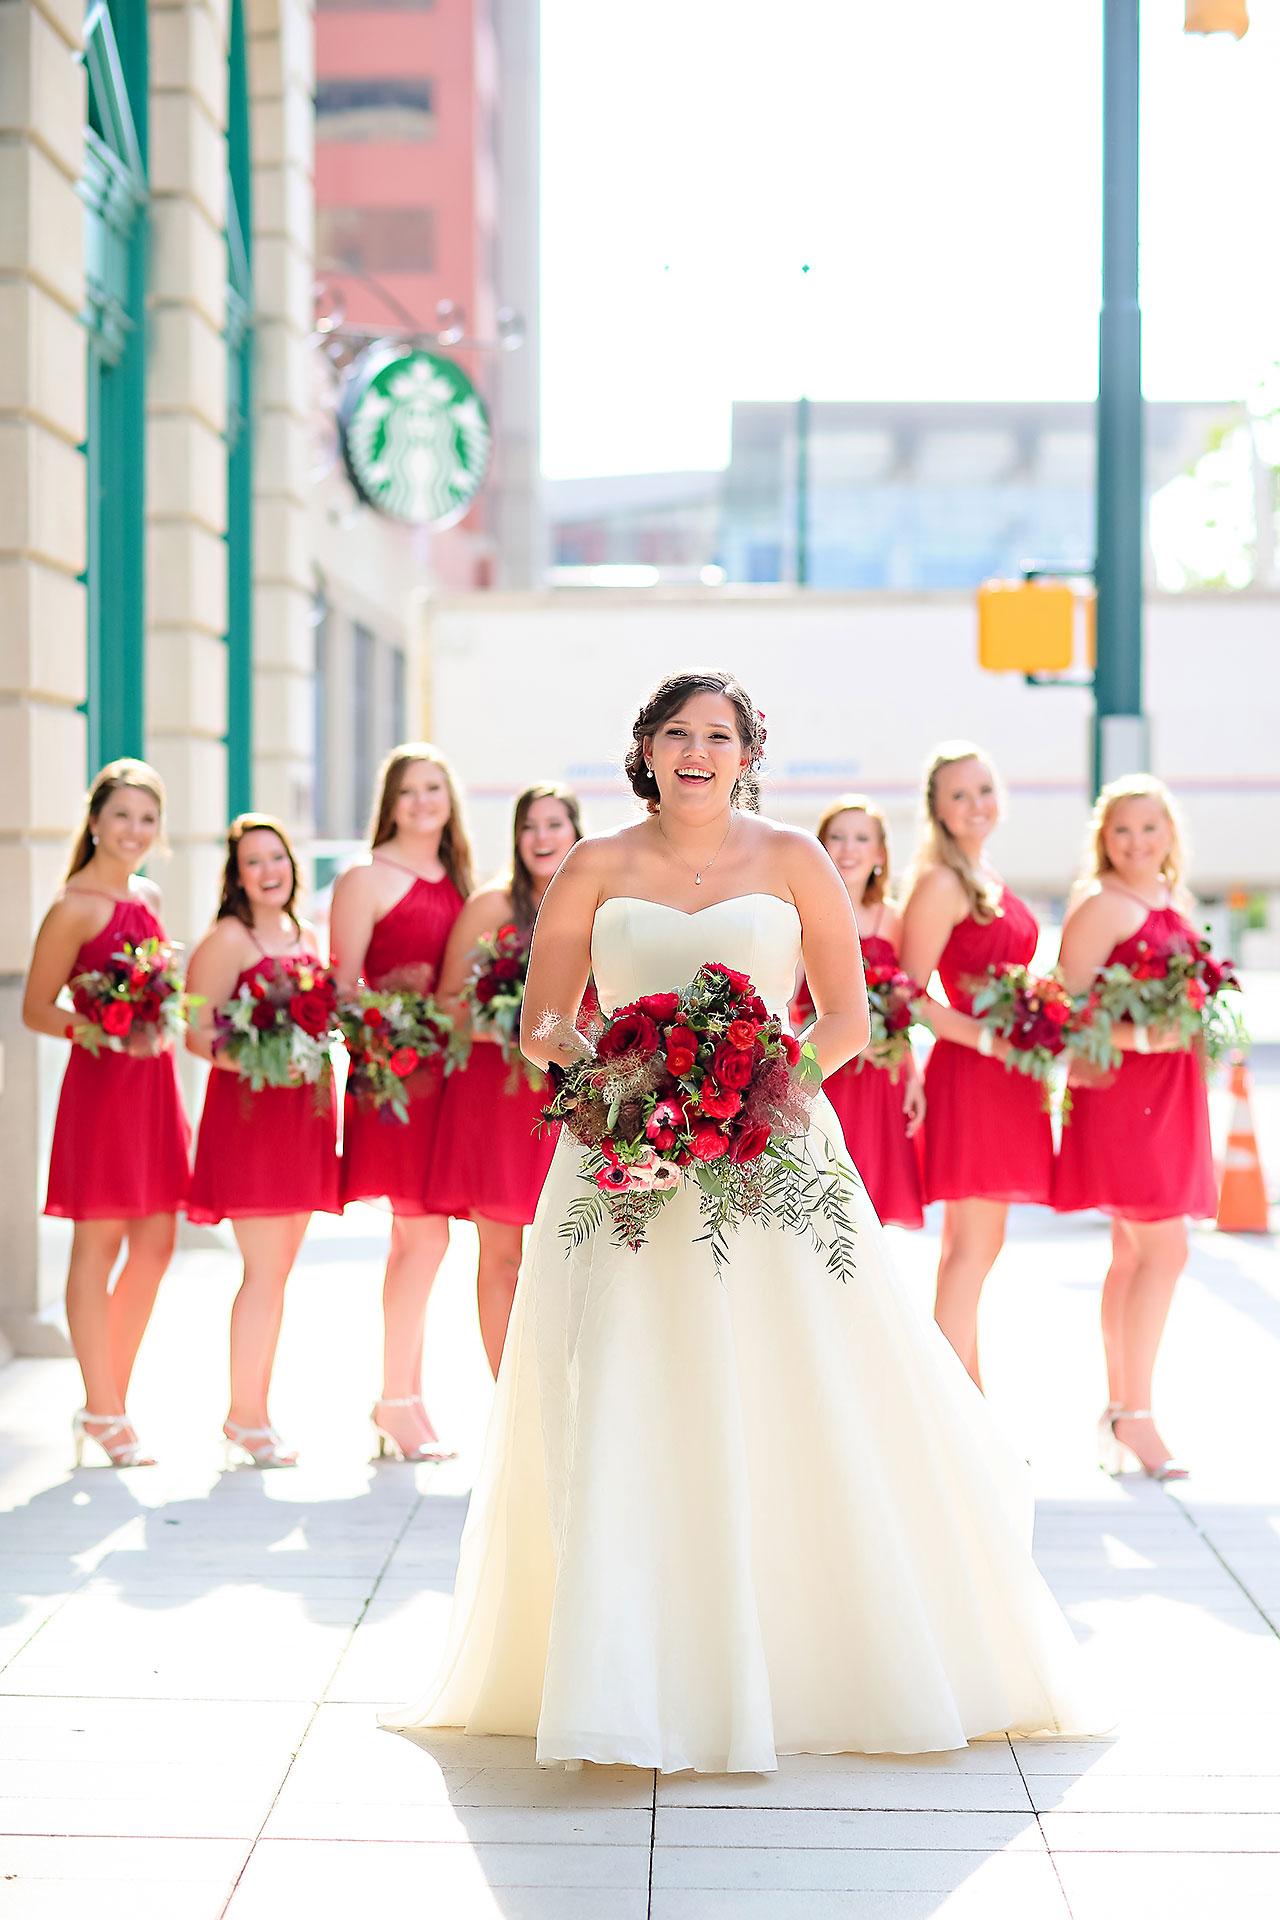 Diana Nick Crowne Plaza Indianapolis Wedding 189